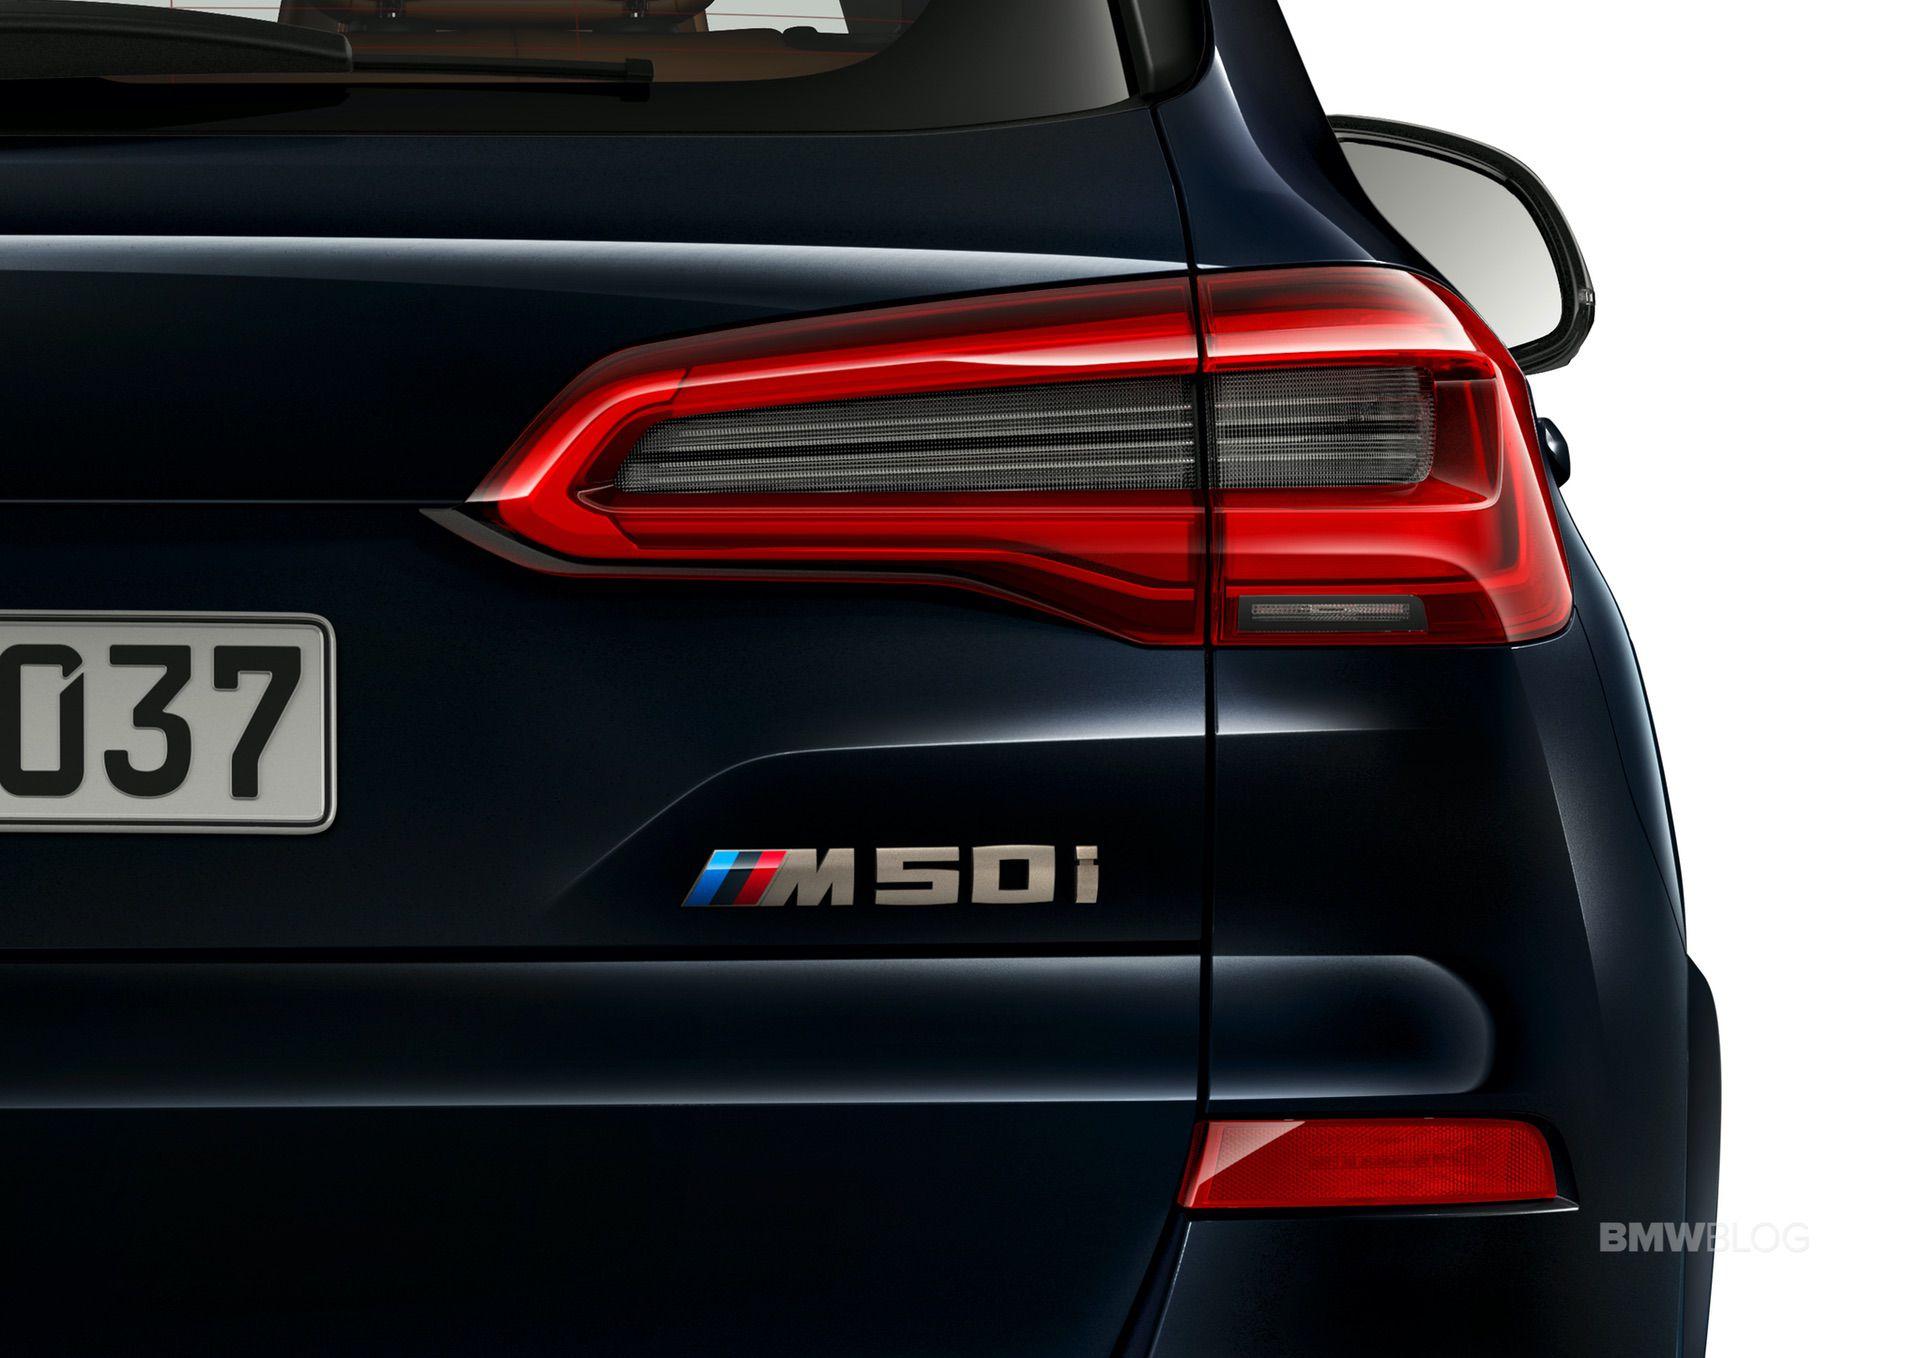 World Premiere 2020 Bmw X5 M50i Suv With Supercar Power